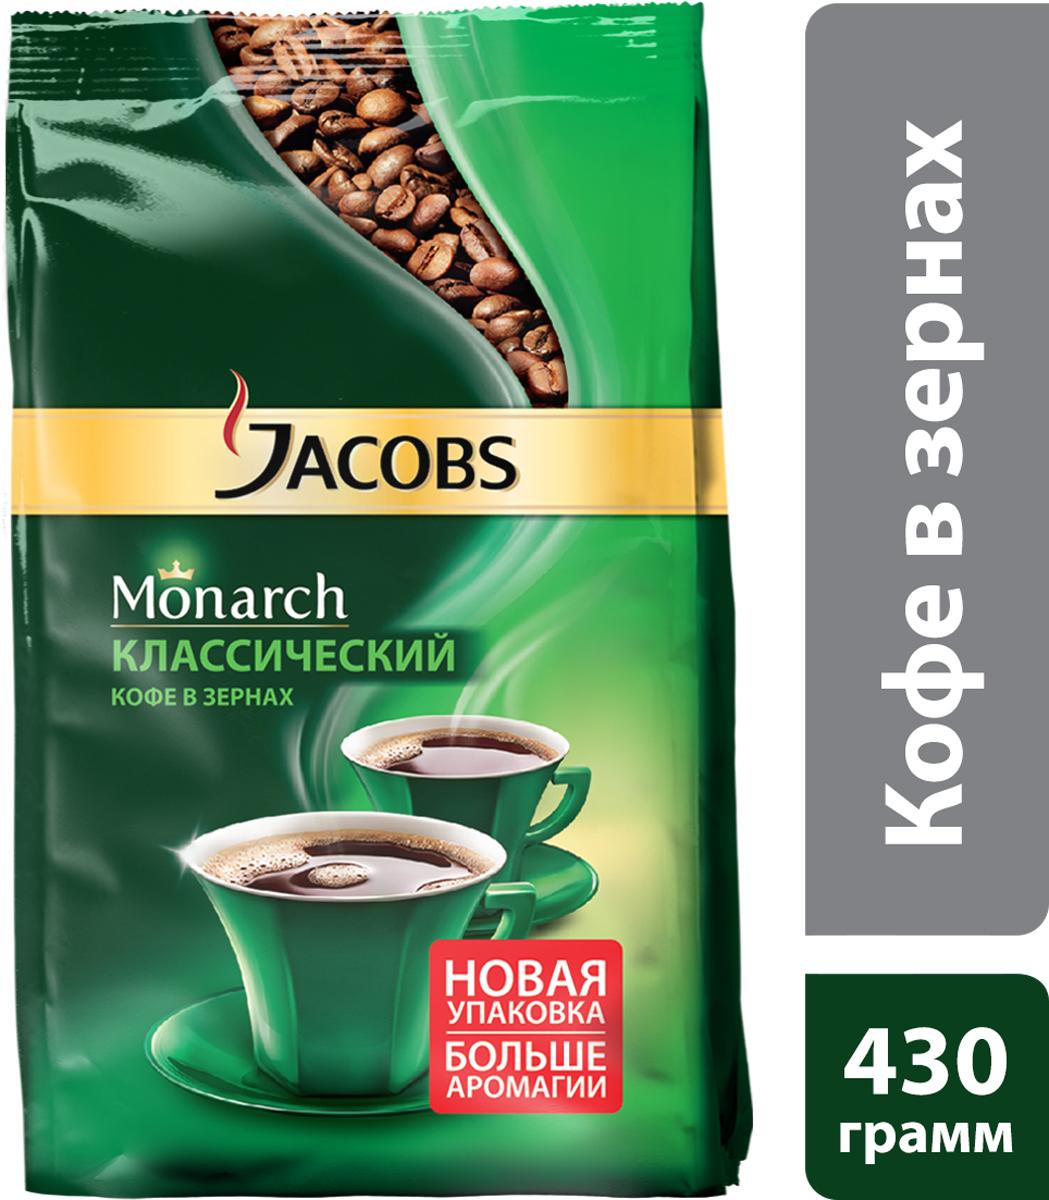 Jacobs Monarch кофе в зернах, 430 г jacobs monarch кофе в зернах 250 г